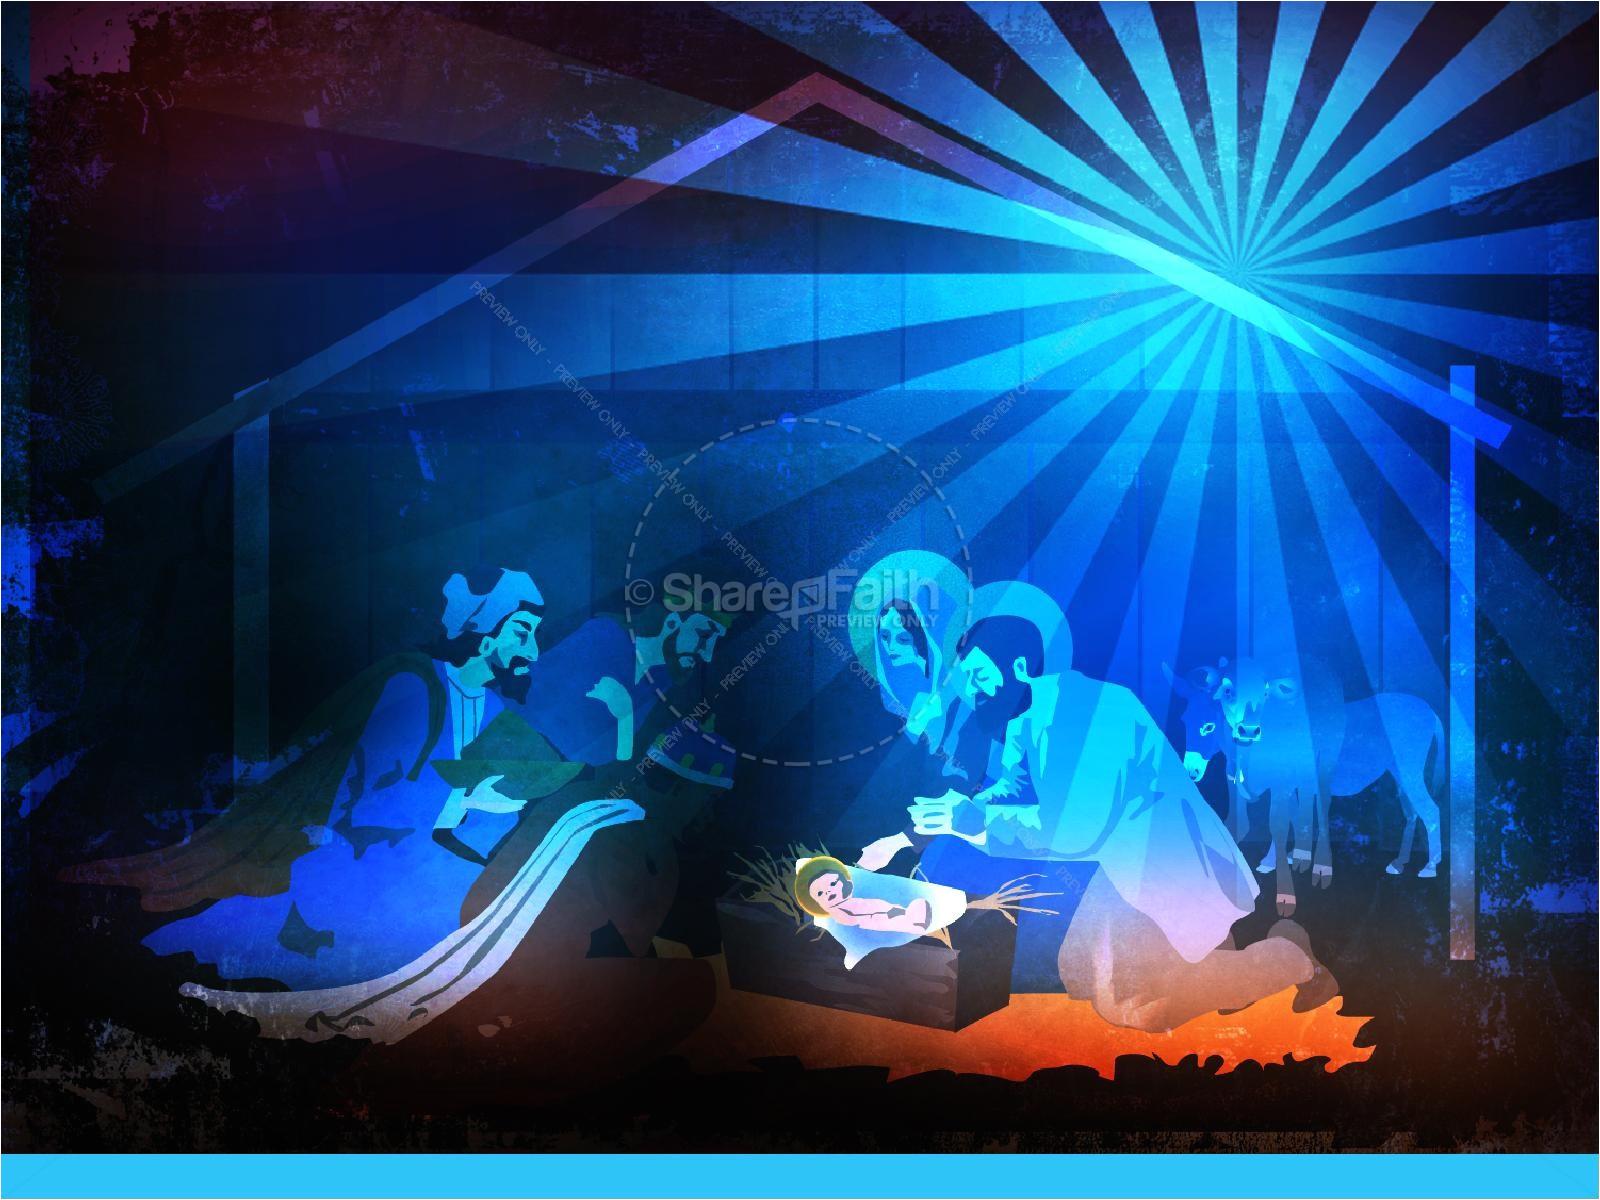 Free Nativity Powerpoint Templates the Nativity Story Christmas Powerpoint Christmas